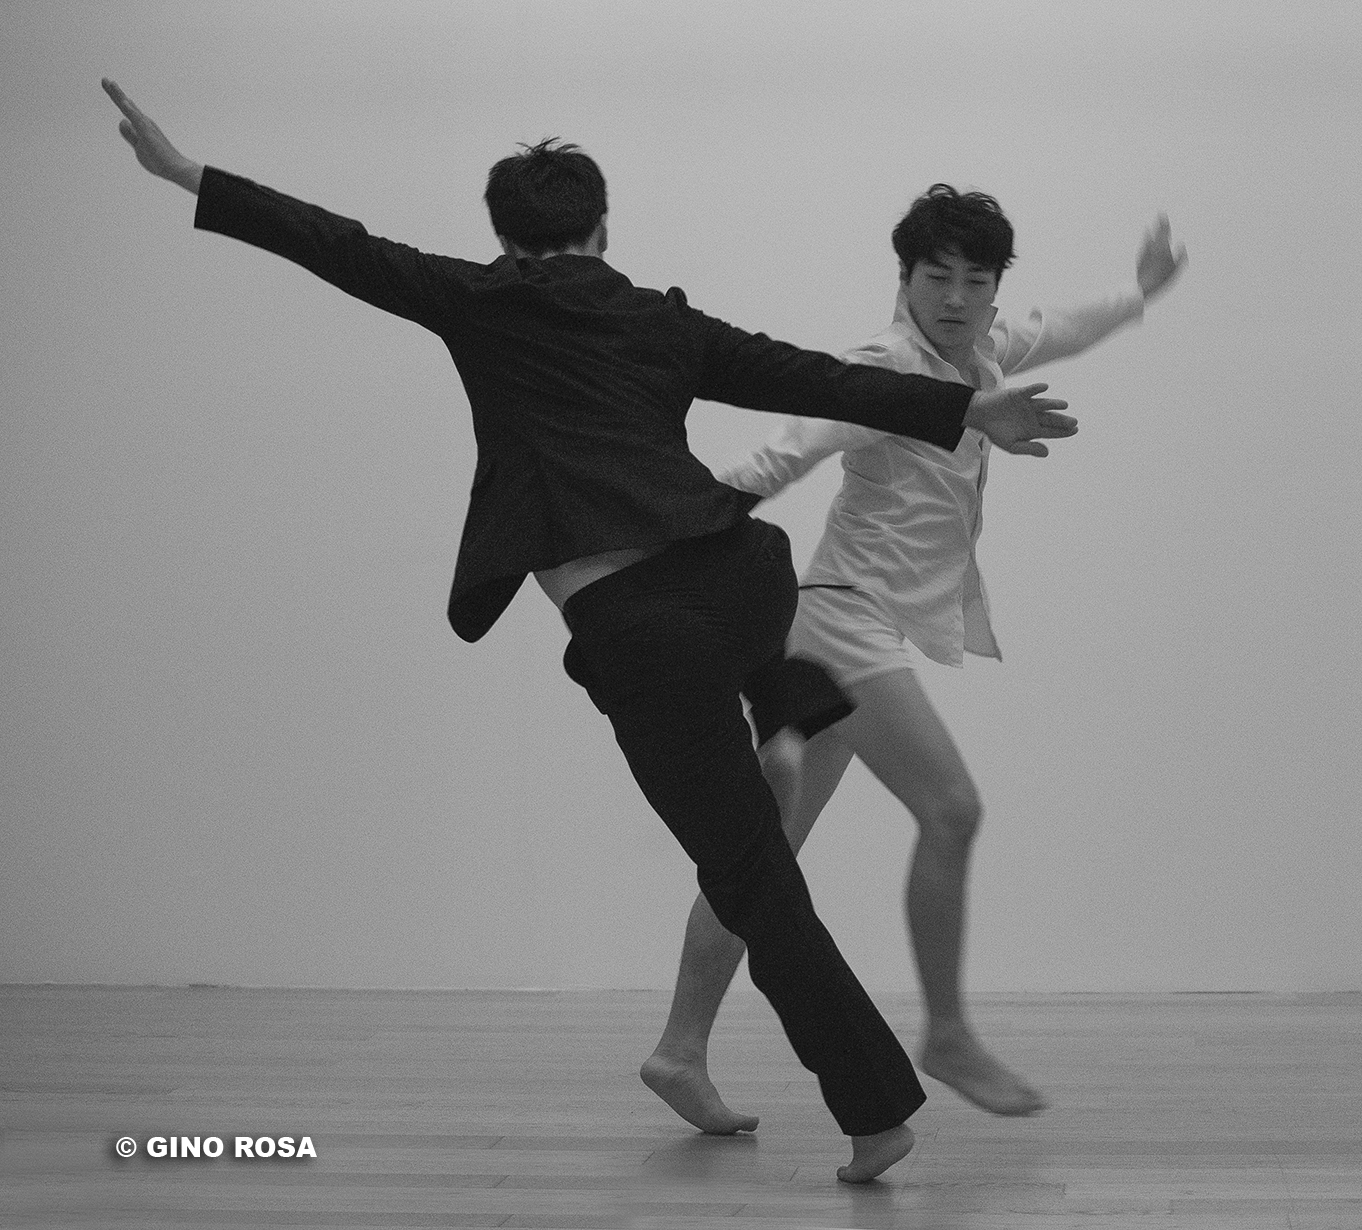 https://www.danzaurbana.eu/associazione/wp-content/uploads/2018/05/Masdanza_Hyunjin_2014.jpg